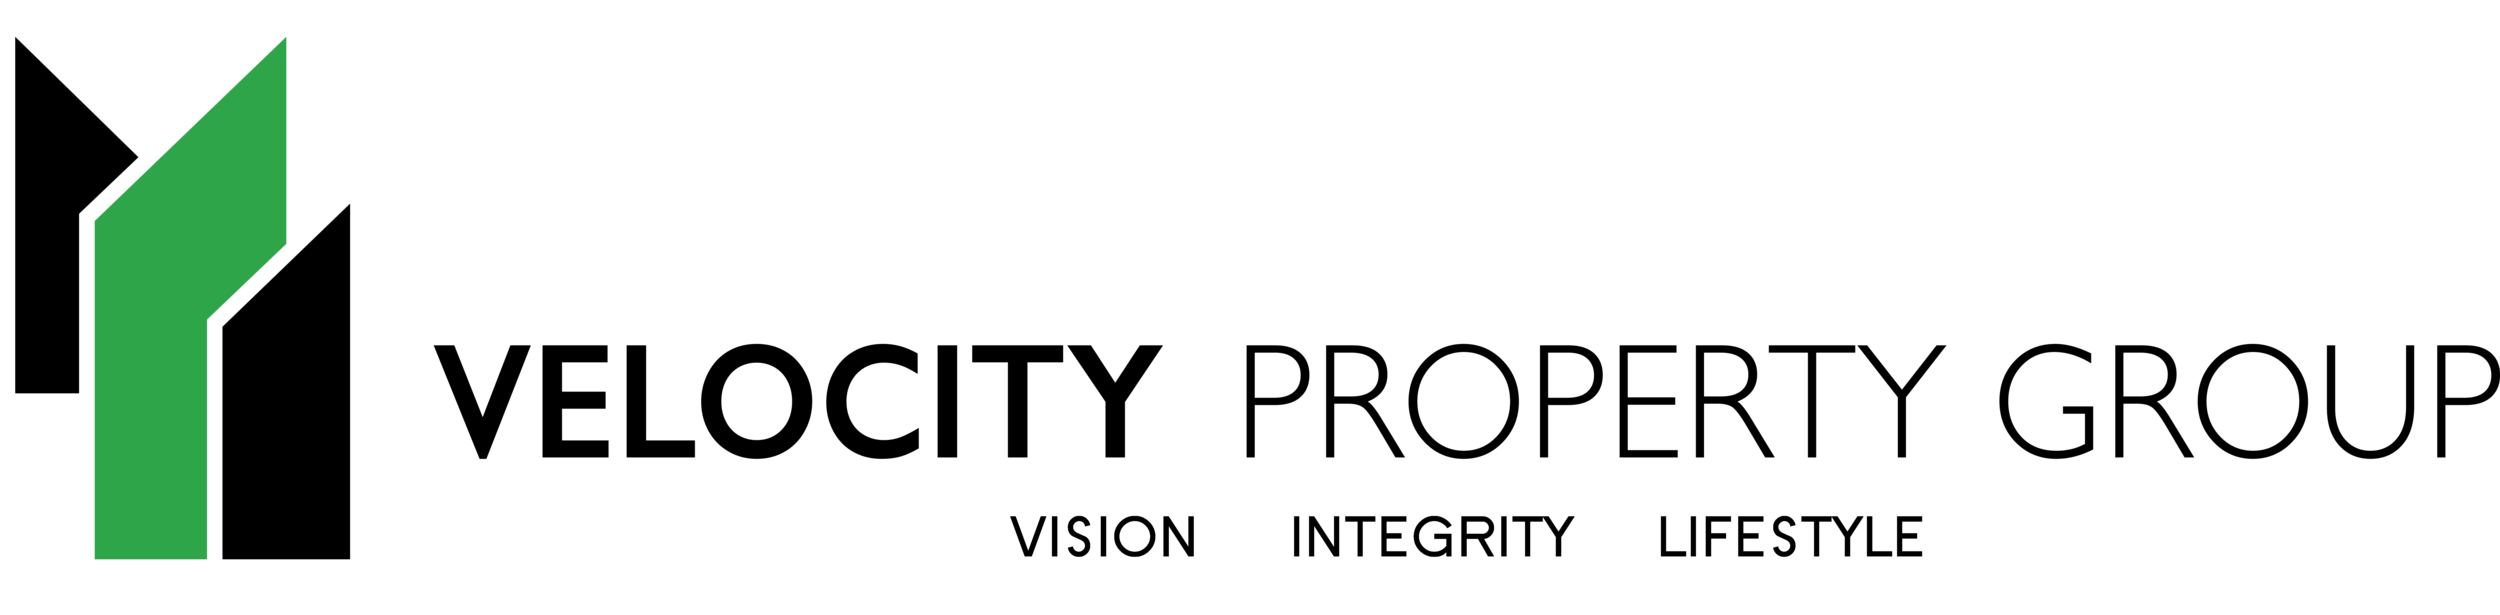 Client-Logos-VPG black text trans background landscape.png